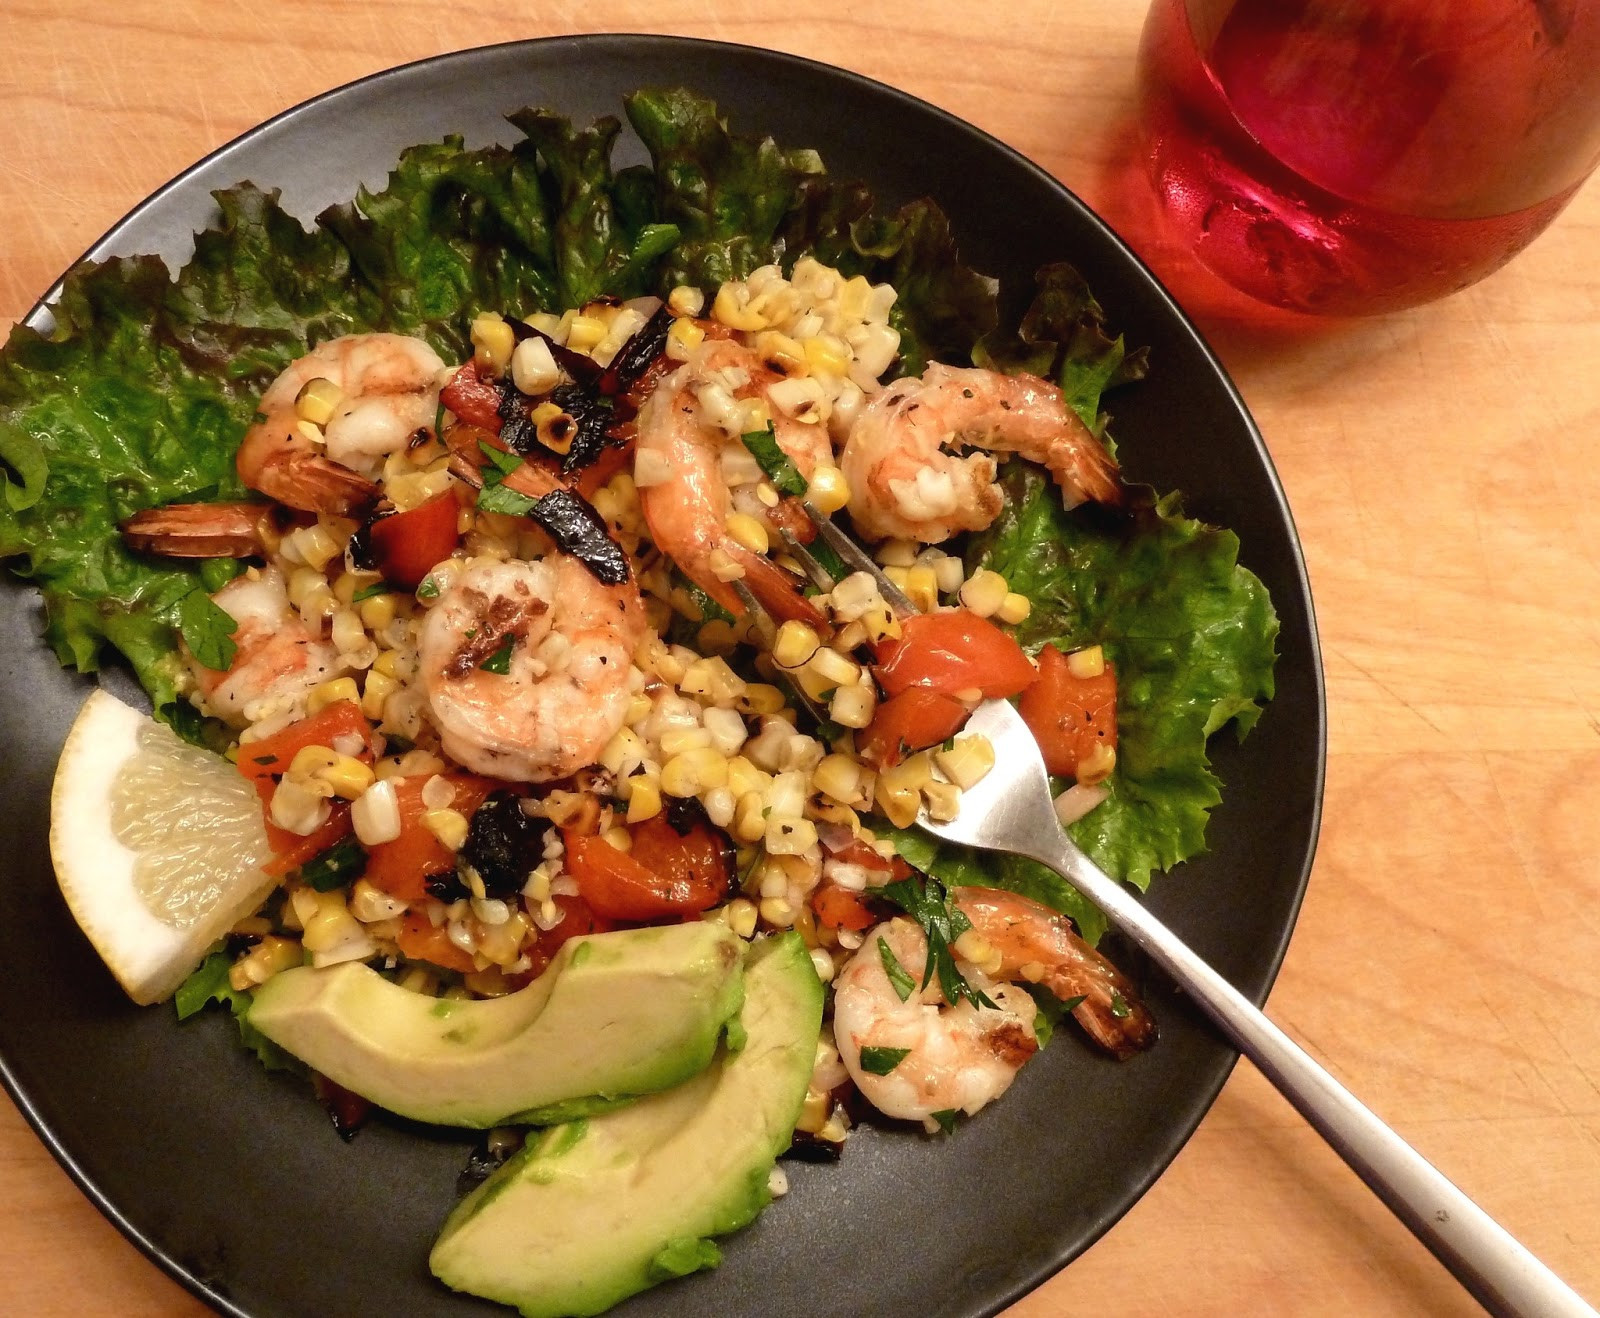 Shrimp And Corn Salad  Cracked Pepper Grilled Shrimp and Corn Salad